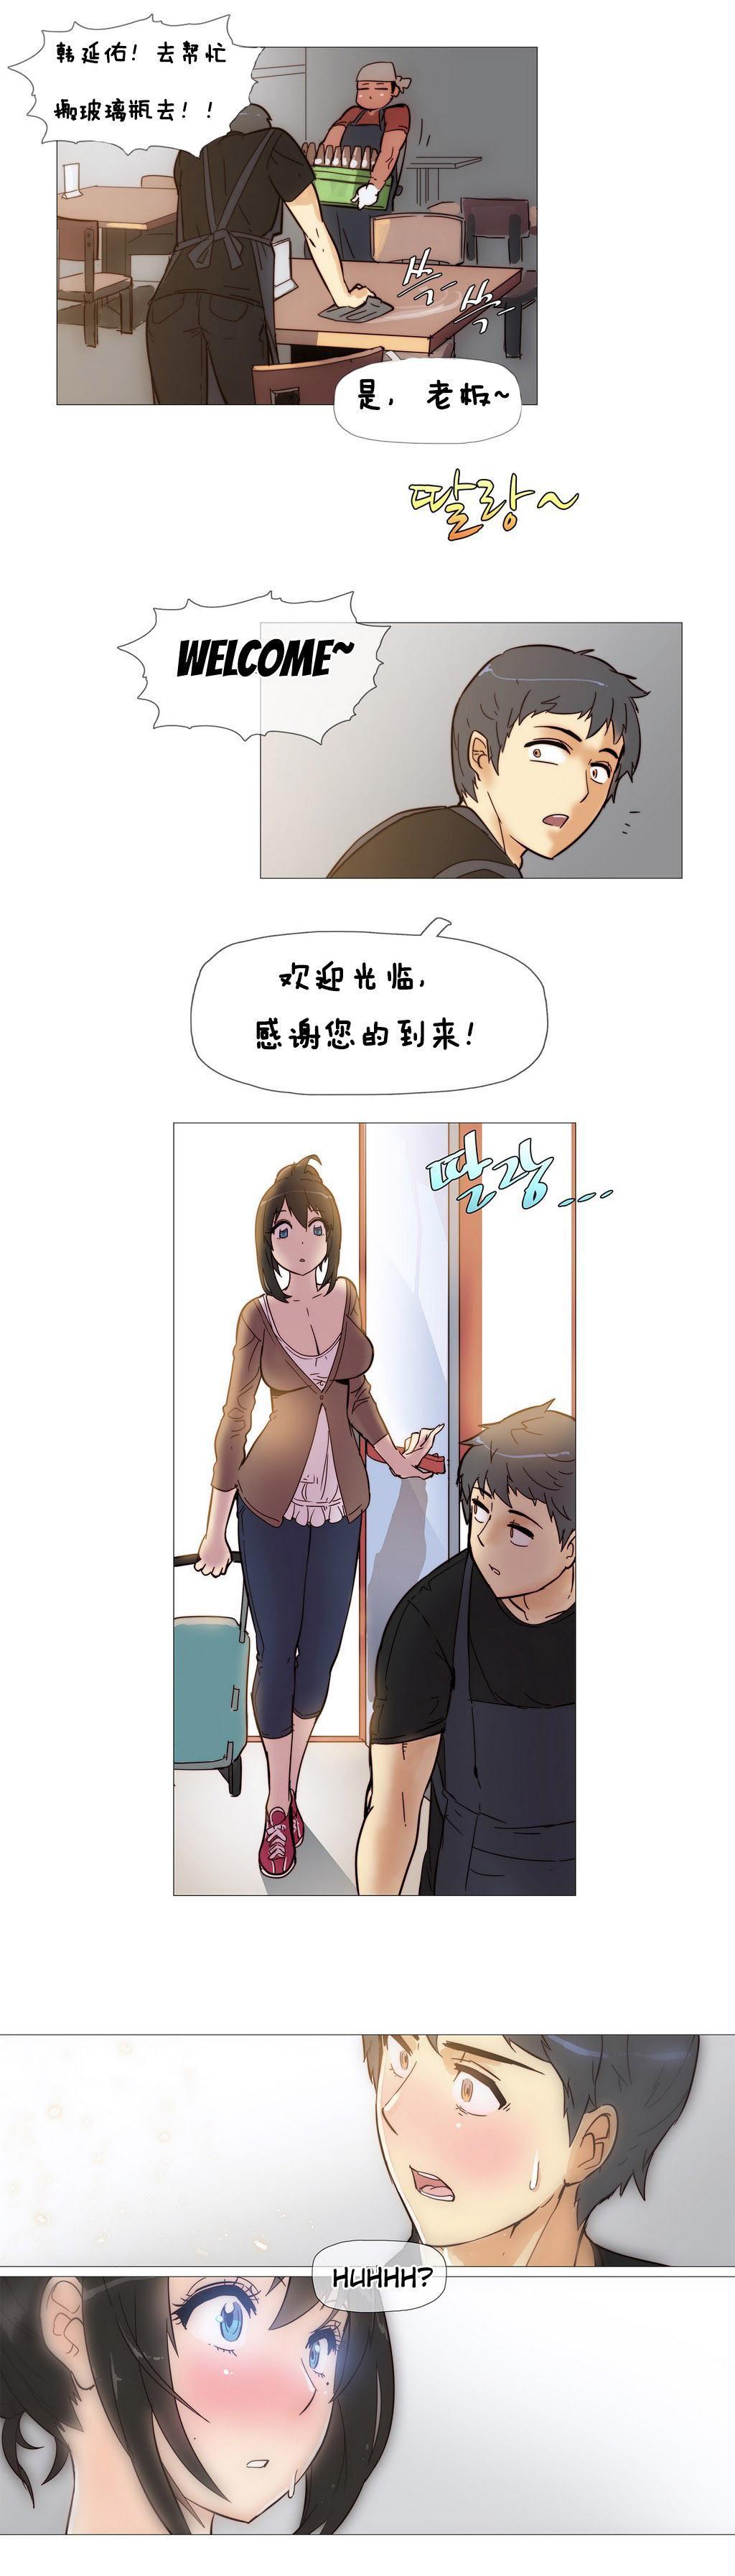 HouseHold Affairs 【卞赤鲤个人汉化】1~33话(持续更新中) 63